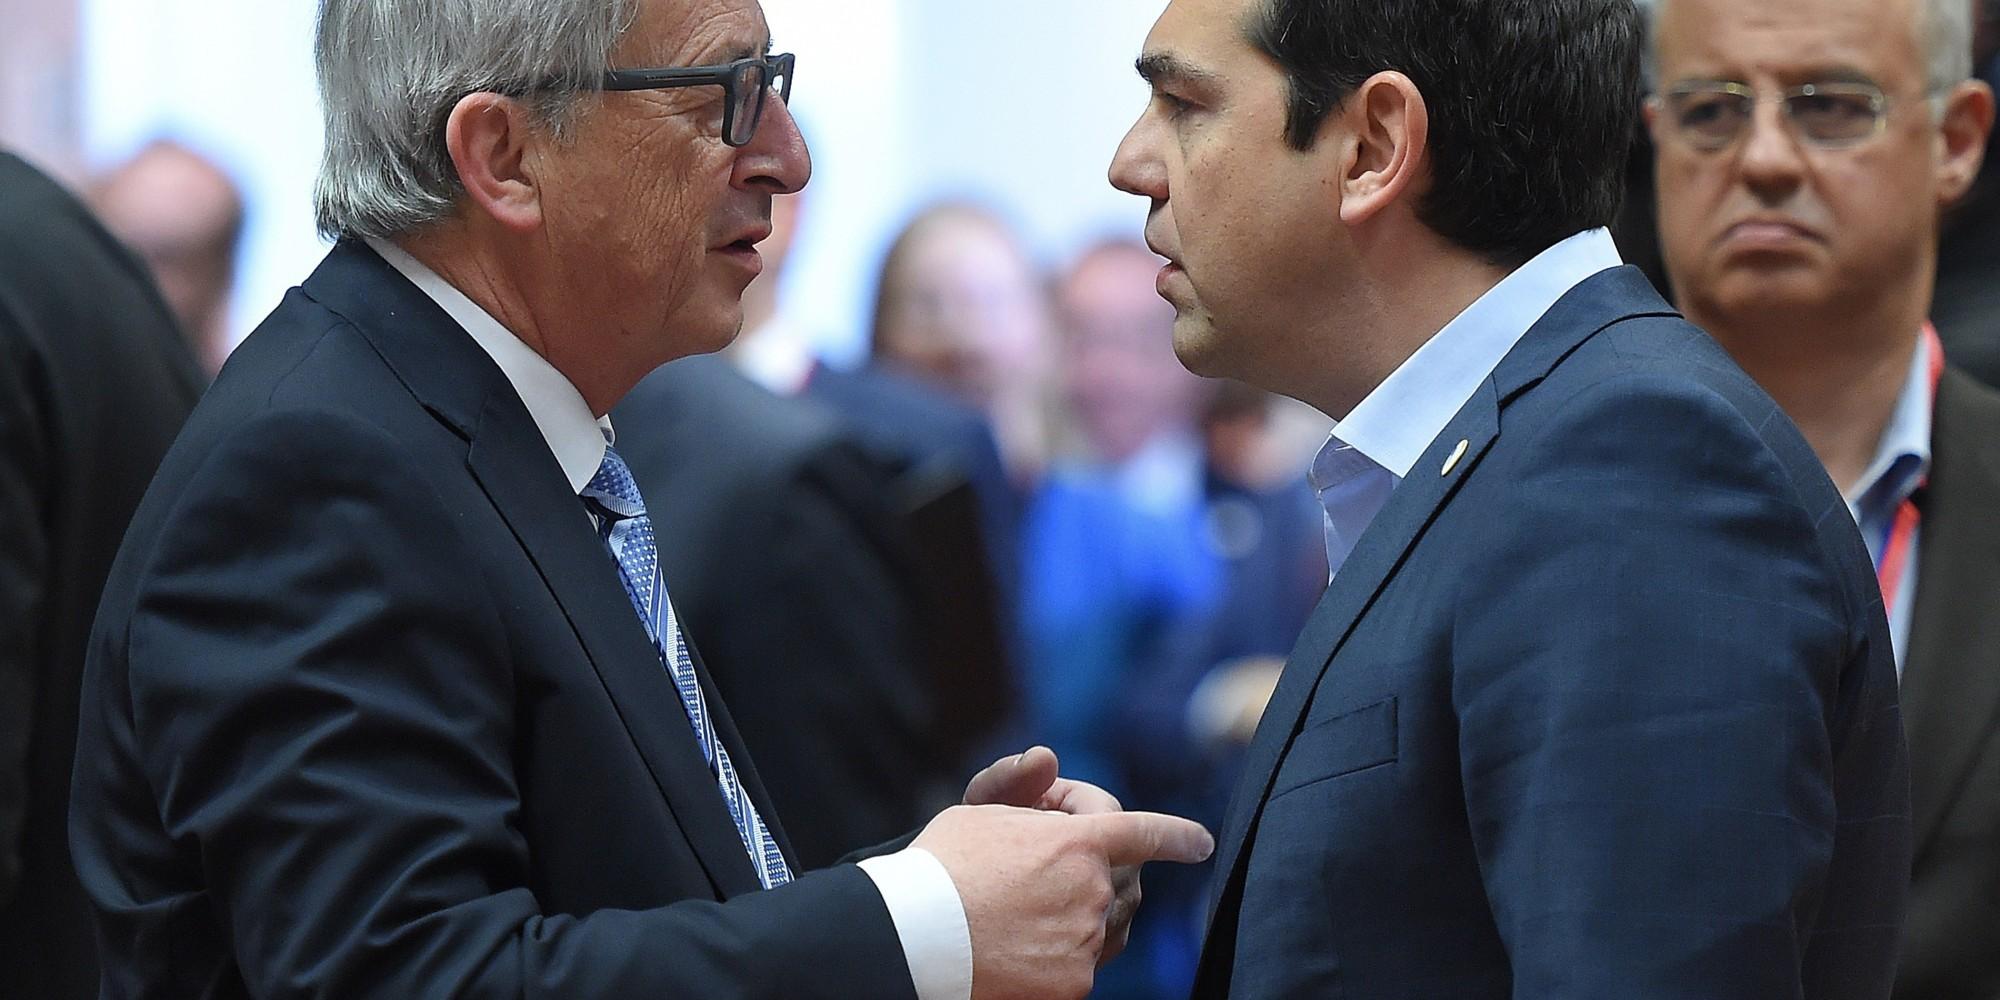 Tsipras meets EU's J.C. Juncker for crunch talks in Brussels